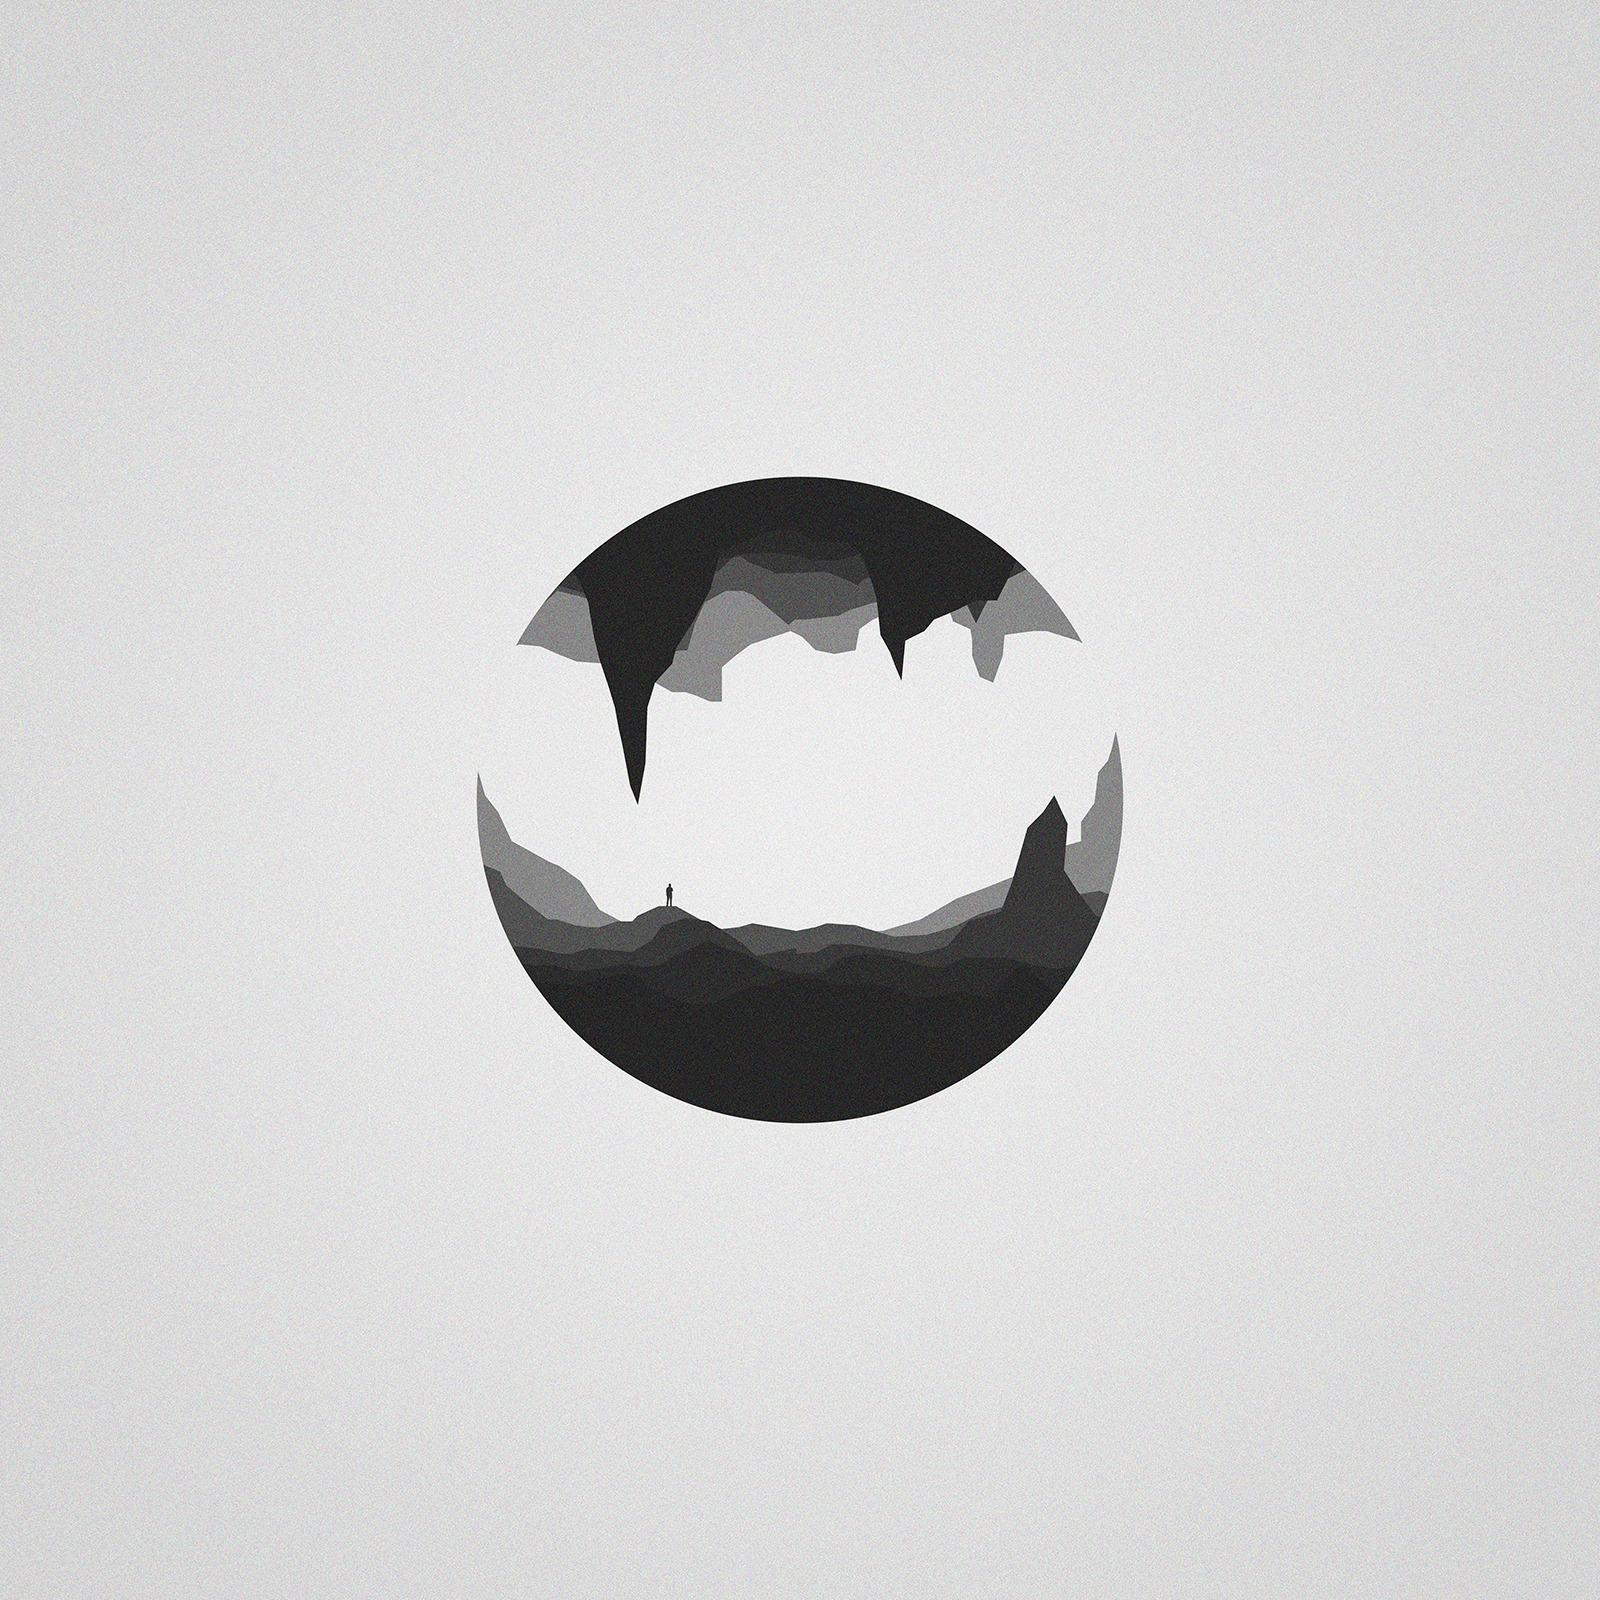 Contemplation - minimalism, minimalist - studiominimalista   ello